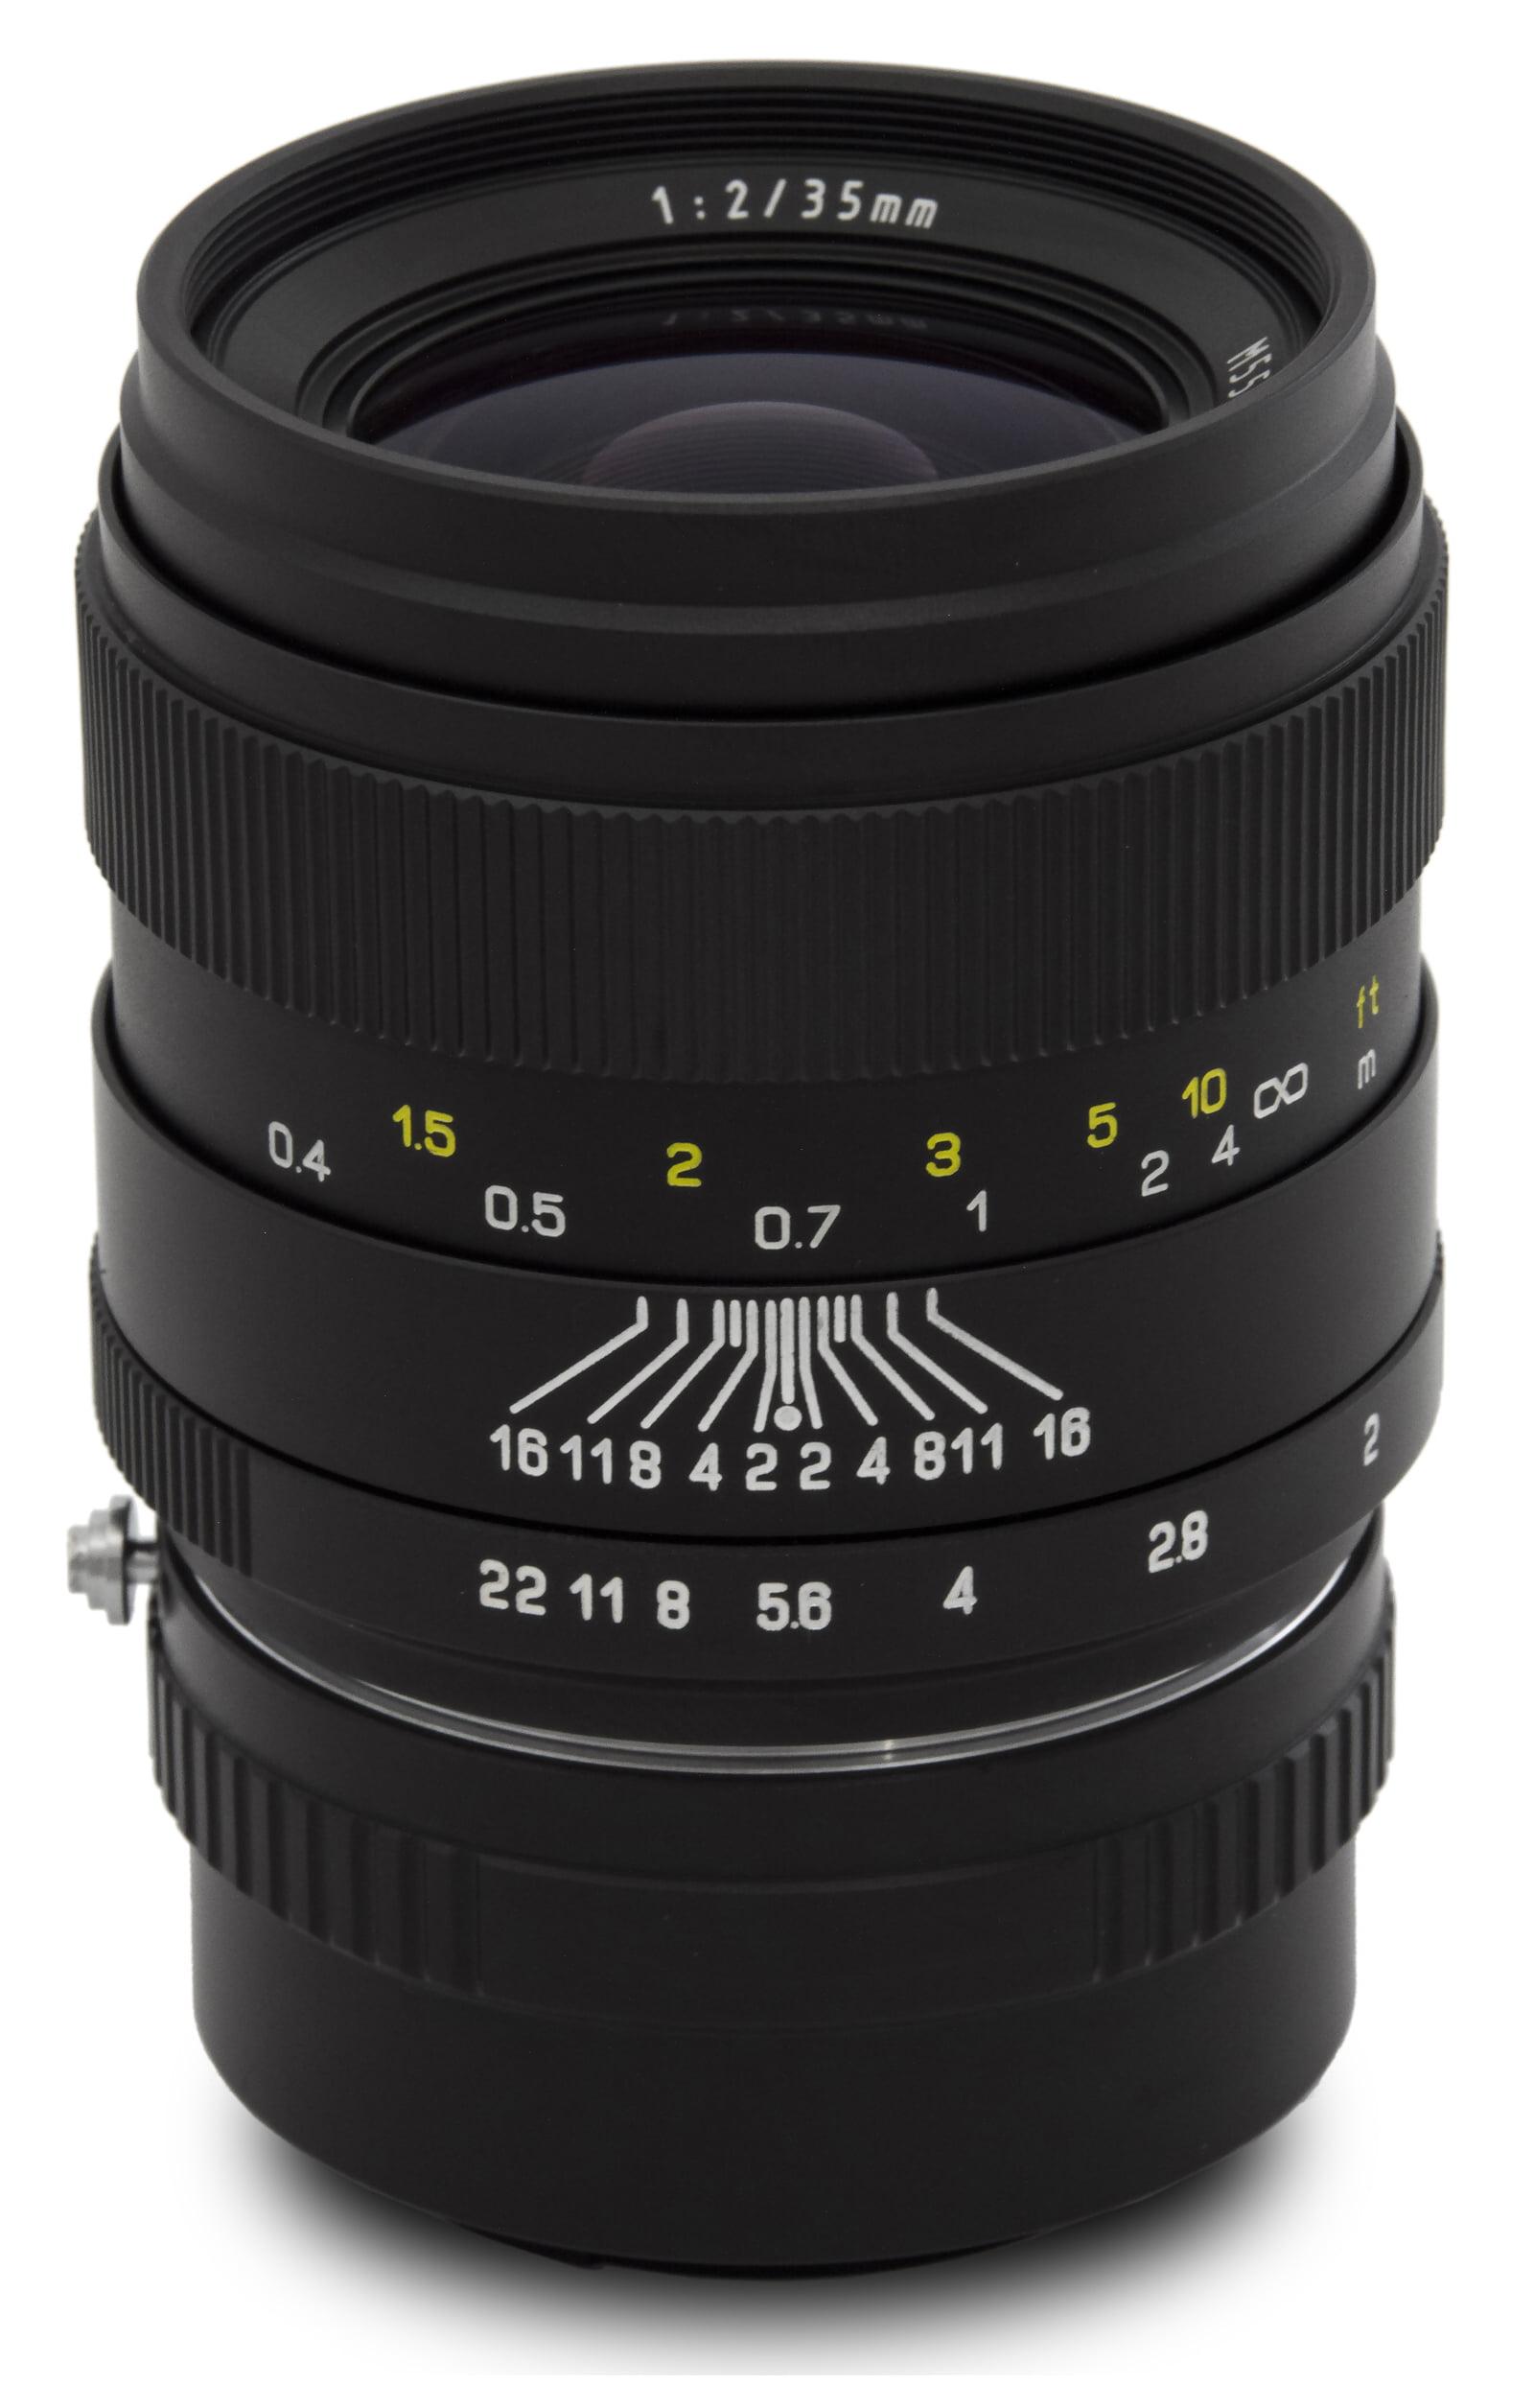 Oshiro 35mm f 2 LD UNC AL Wide Angle Full Frame Prime Lens for Fuji X-Pro2, X-Pro1, X-T10, X-E2S, X-T1, X-E2, X-E1,... by Oshiro